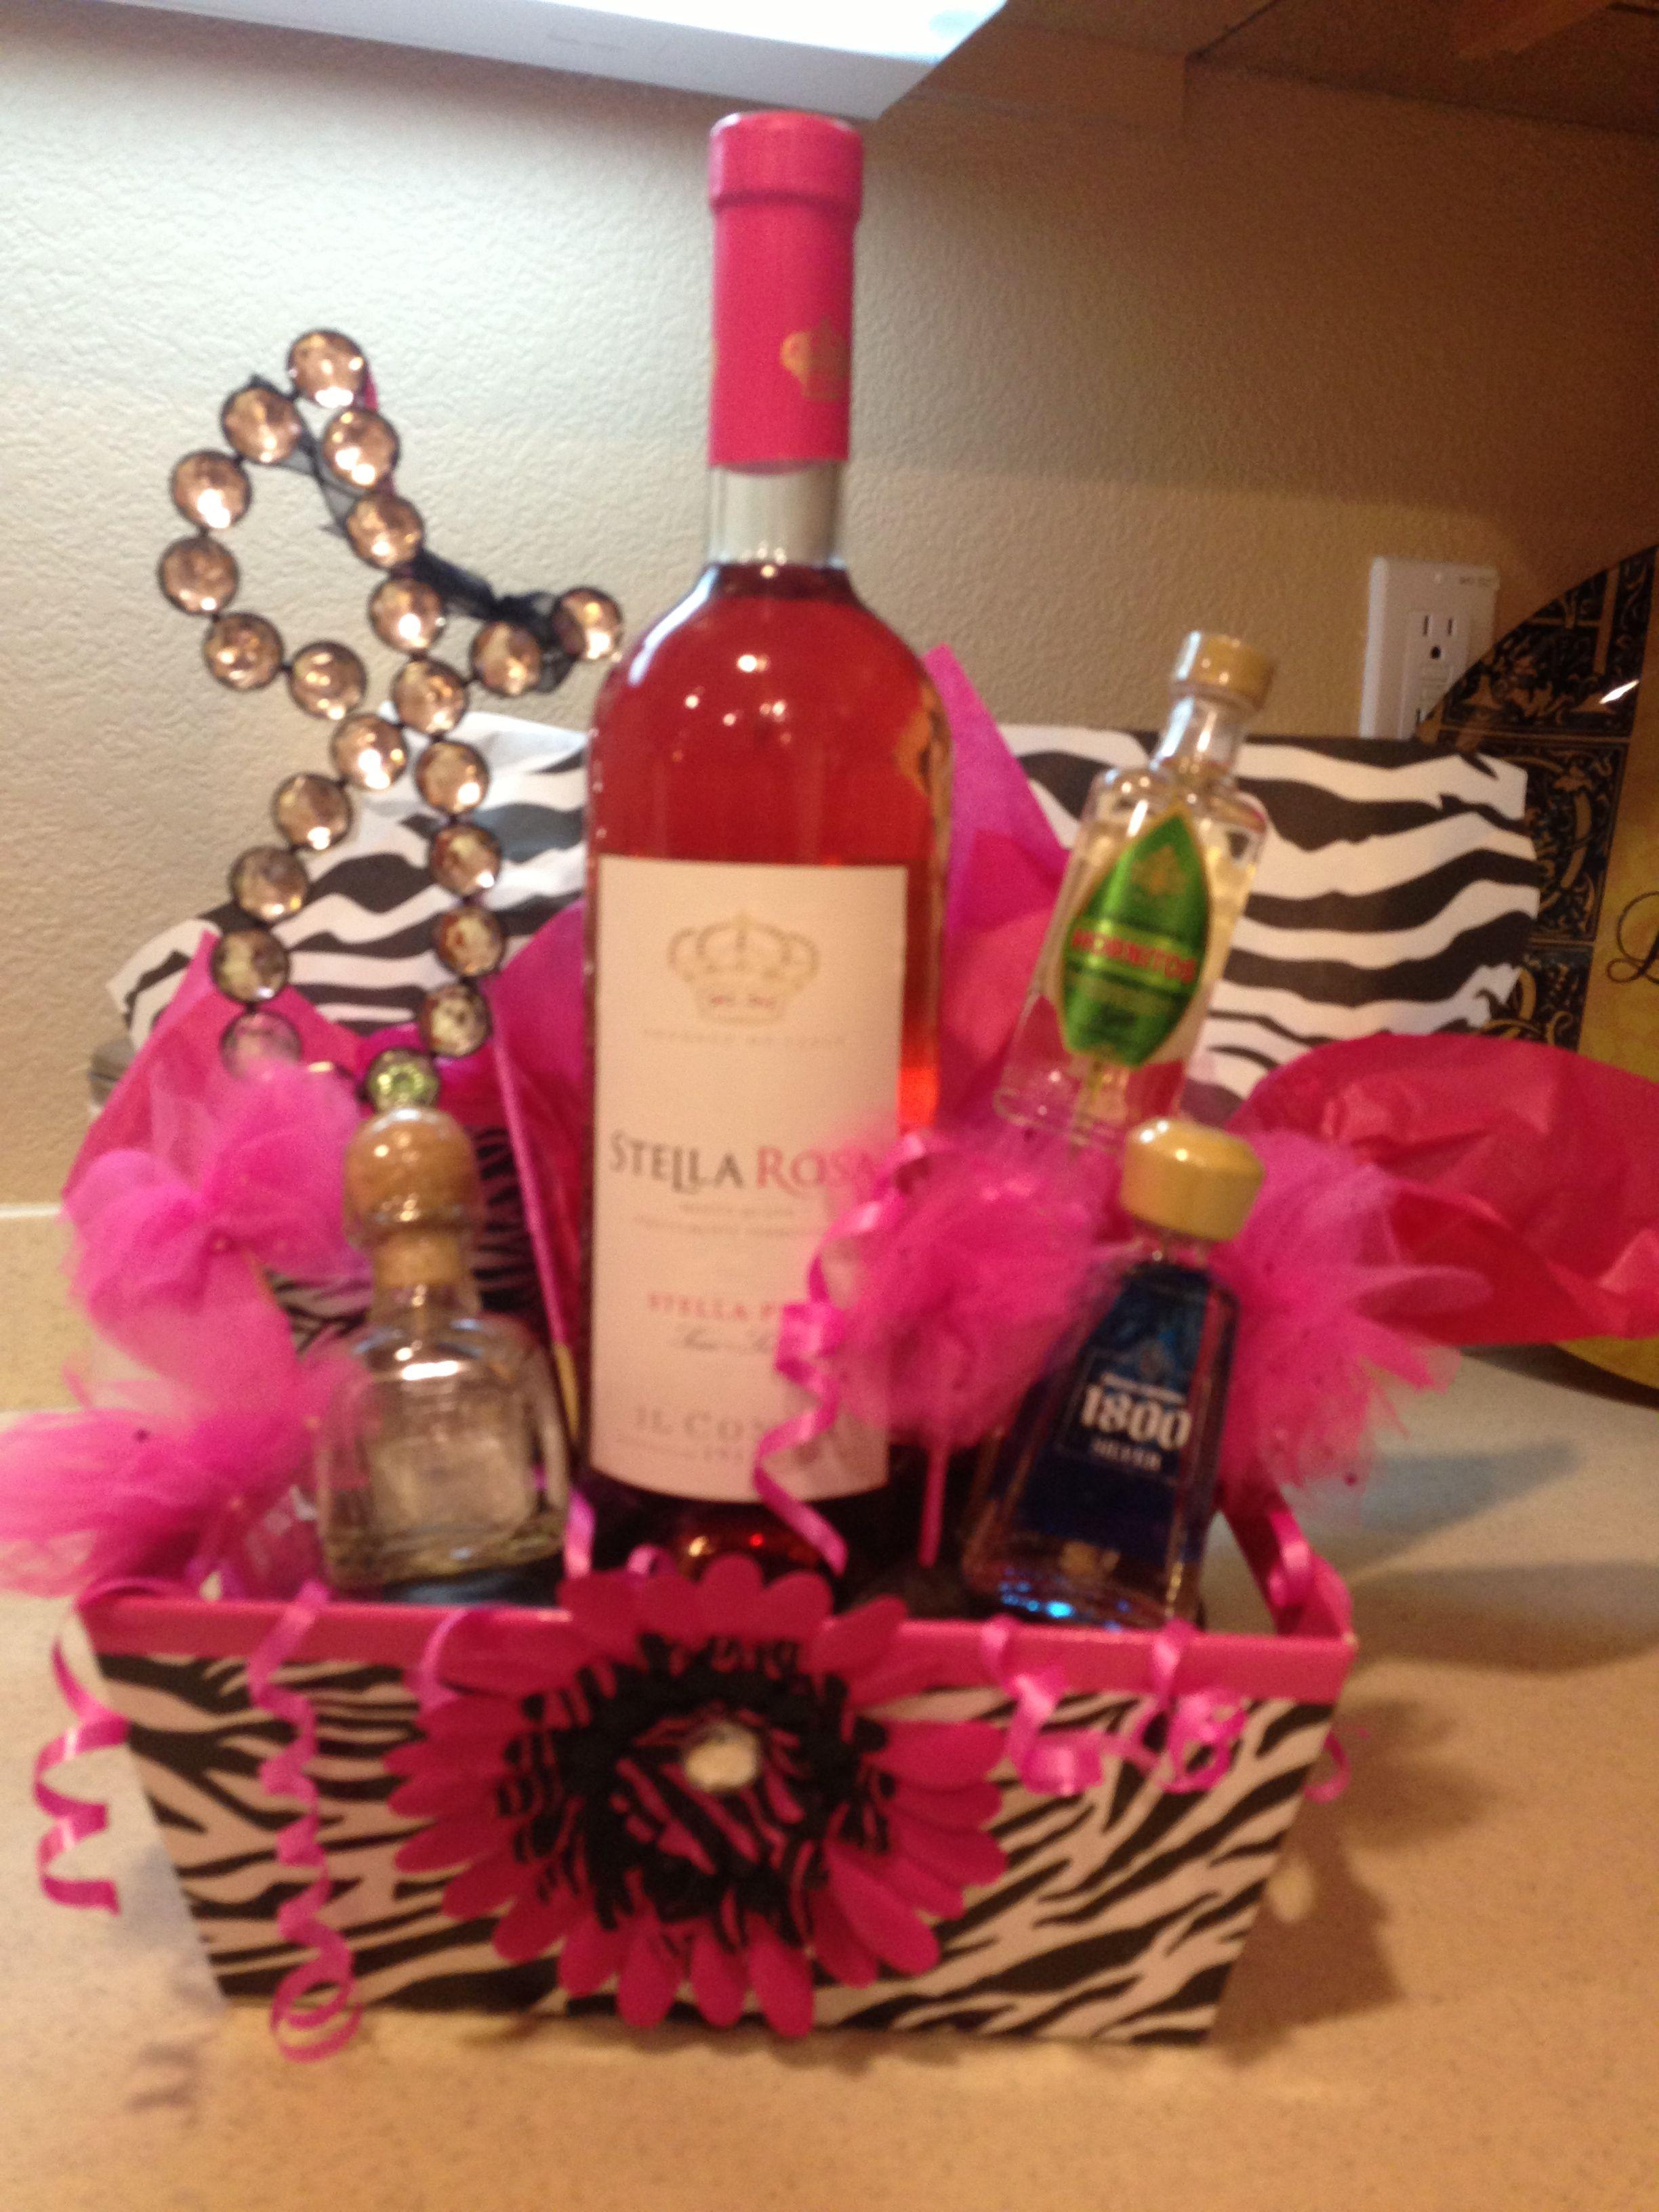 Stella Rosa And Tequila Birthday Basket Wine Gift Baskets Birthday Basket Mothers Day Baskets